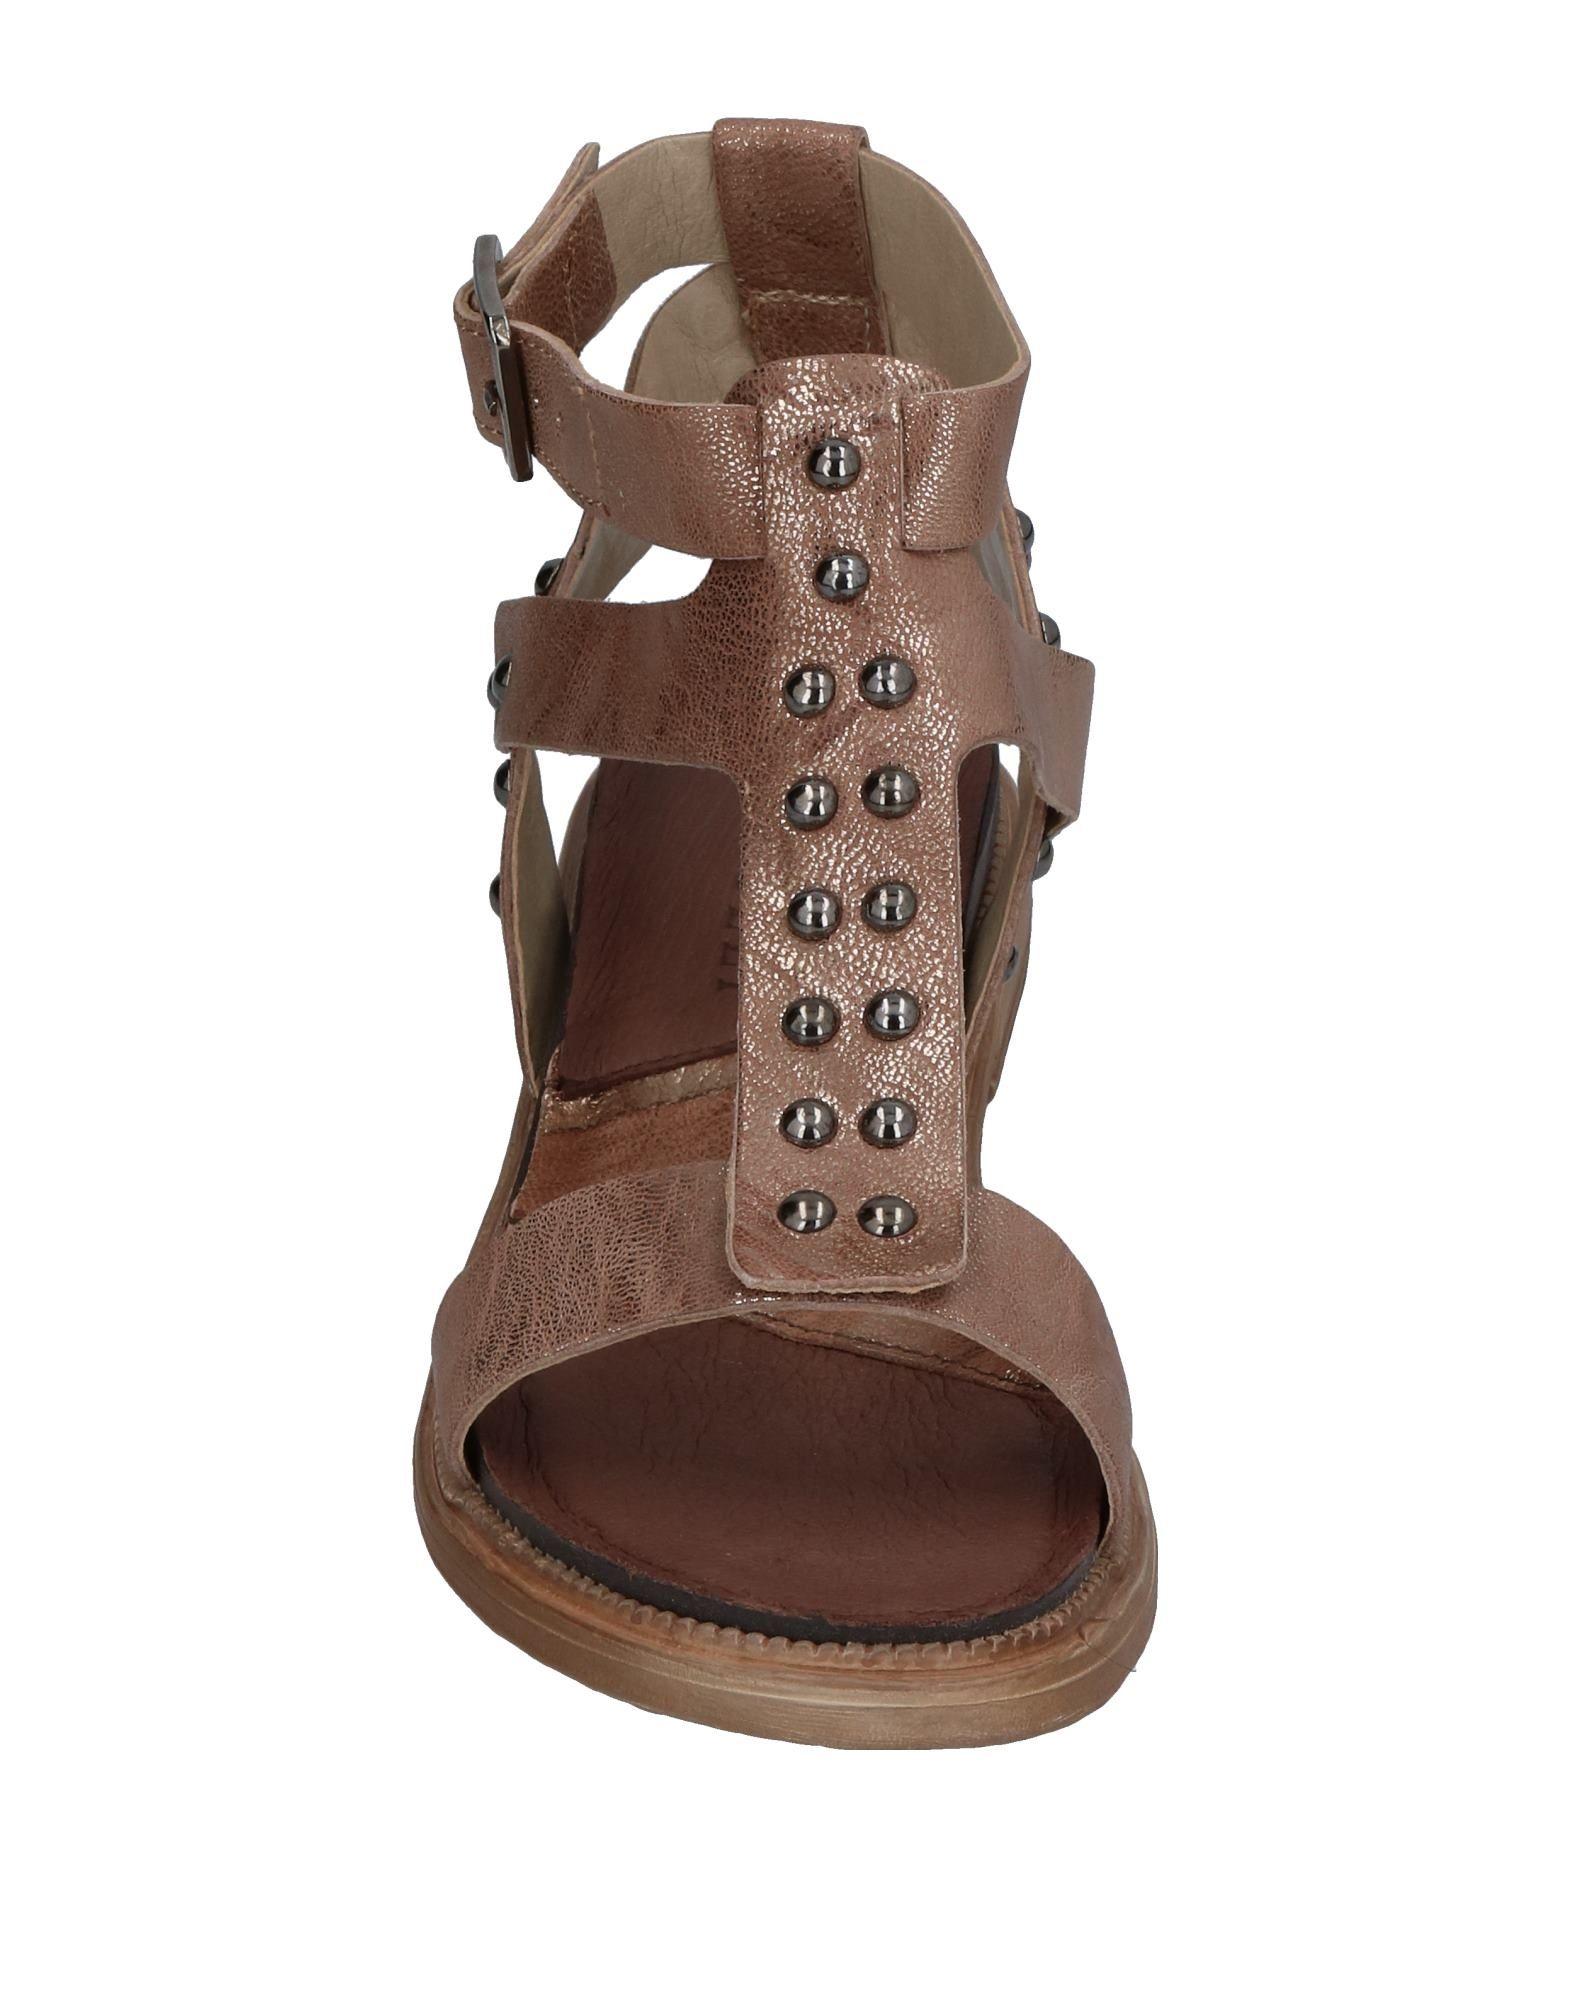 Sandales Fabbrica Deicolli Femme - Sandales Fabbrica Deicolli sur